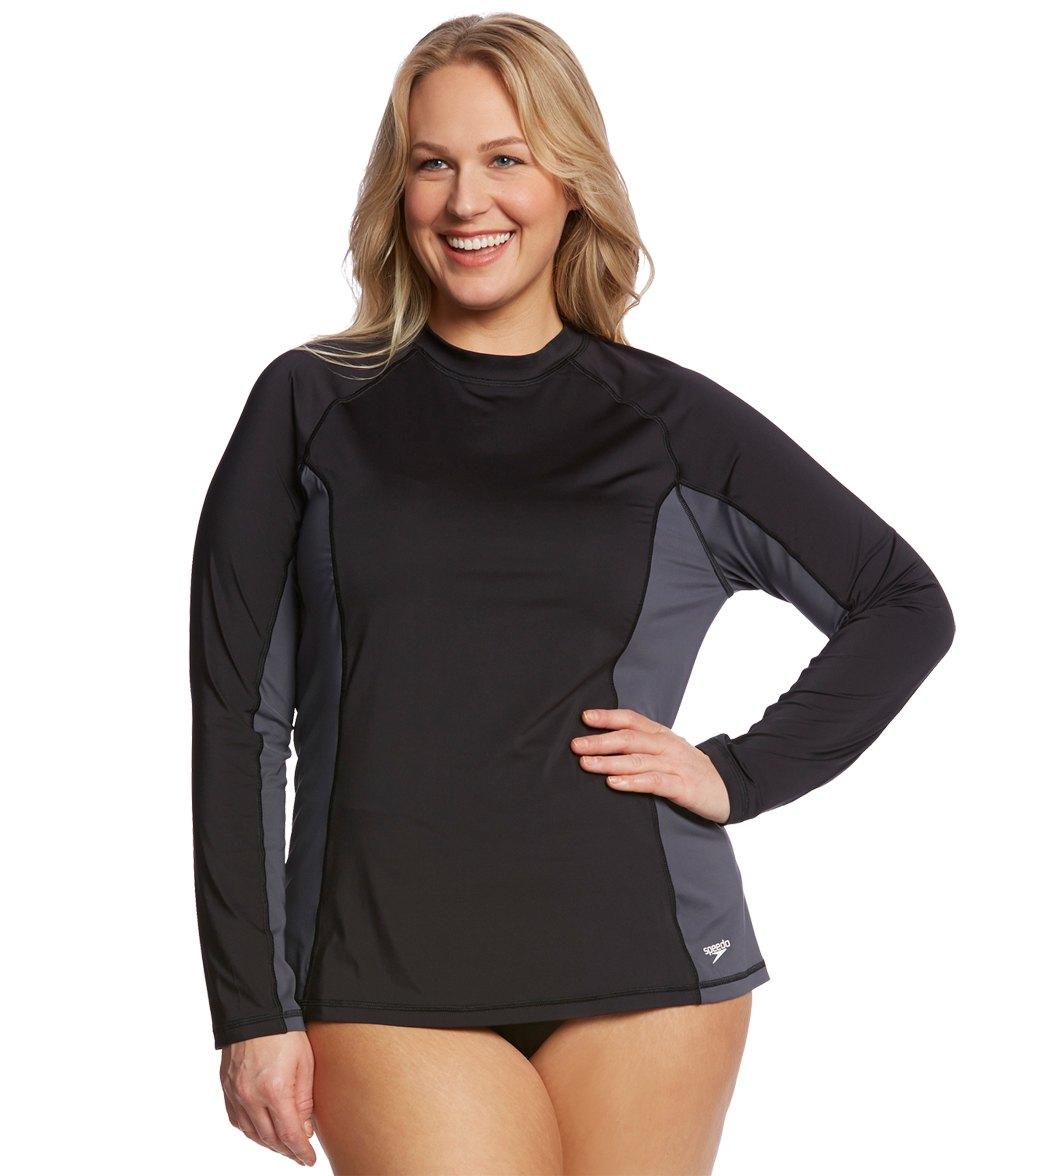 464a7f1b3b4 ... Women s Long Sleeve Plus Size Rashguard. Play Video. MODEL MEASUREMENTS